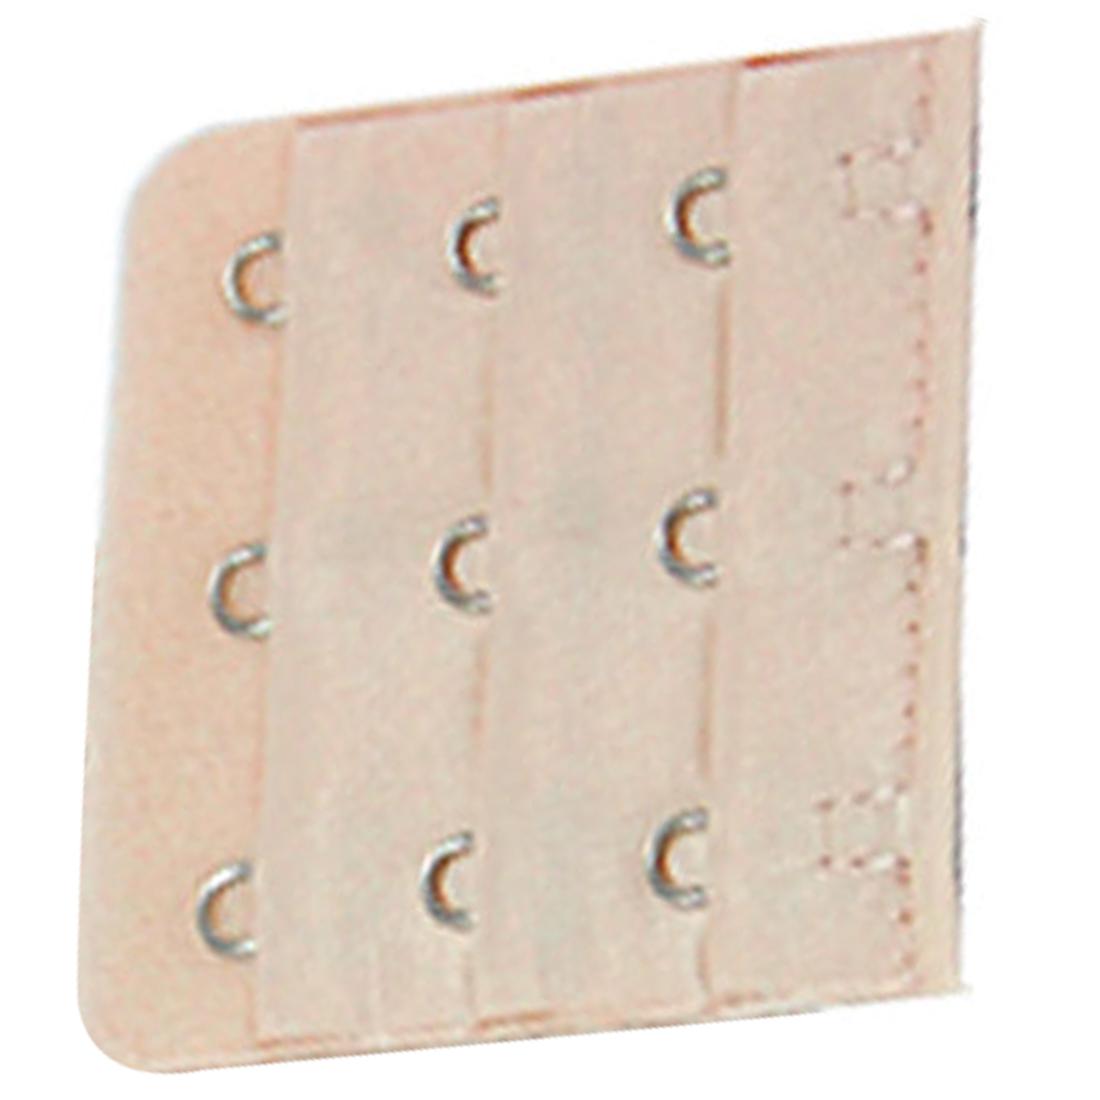 5 Pcs Wheat Bra Soft Extender 3x3 Hooks Extenders Strap